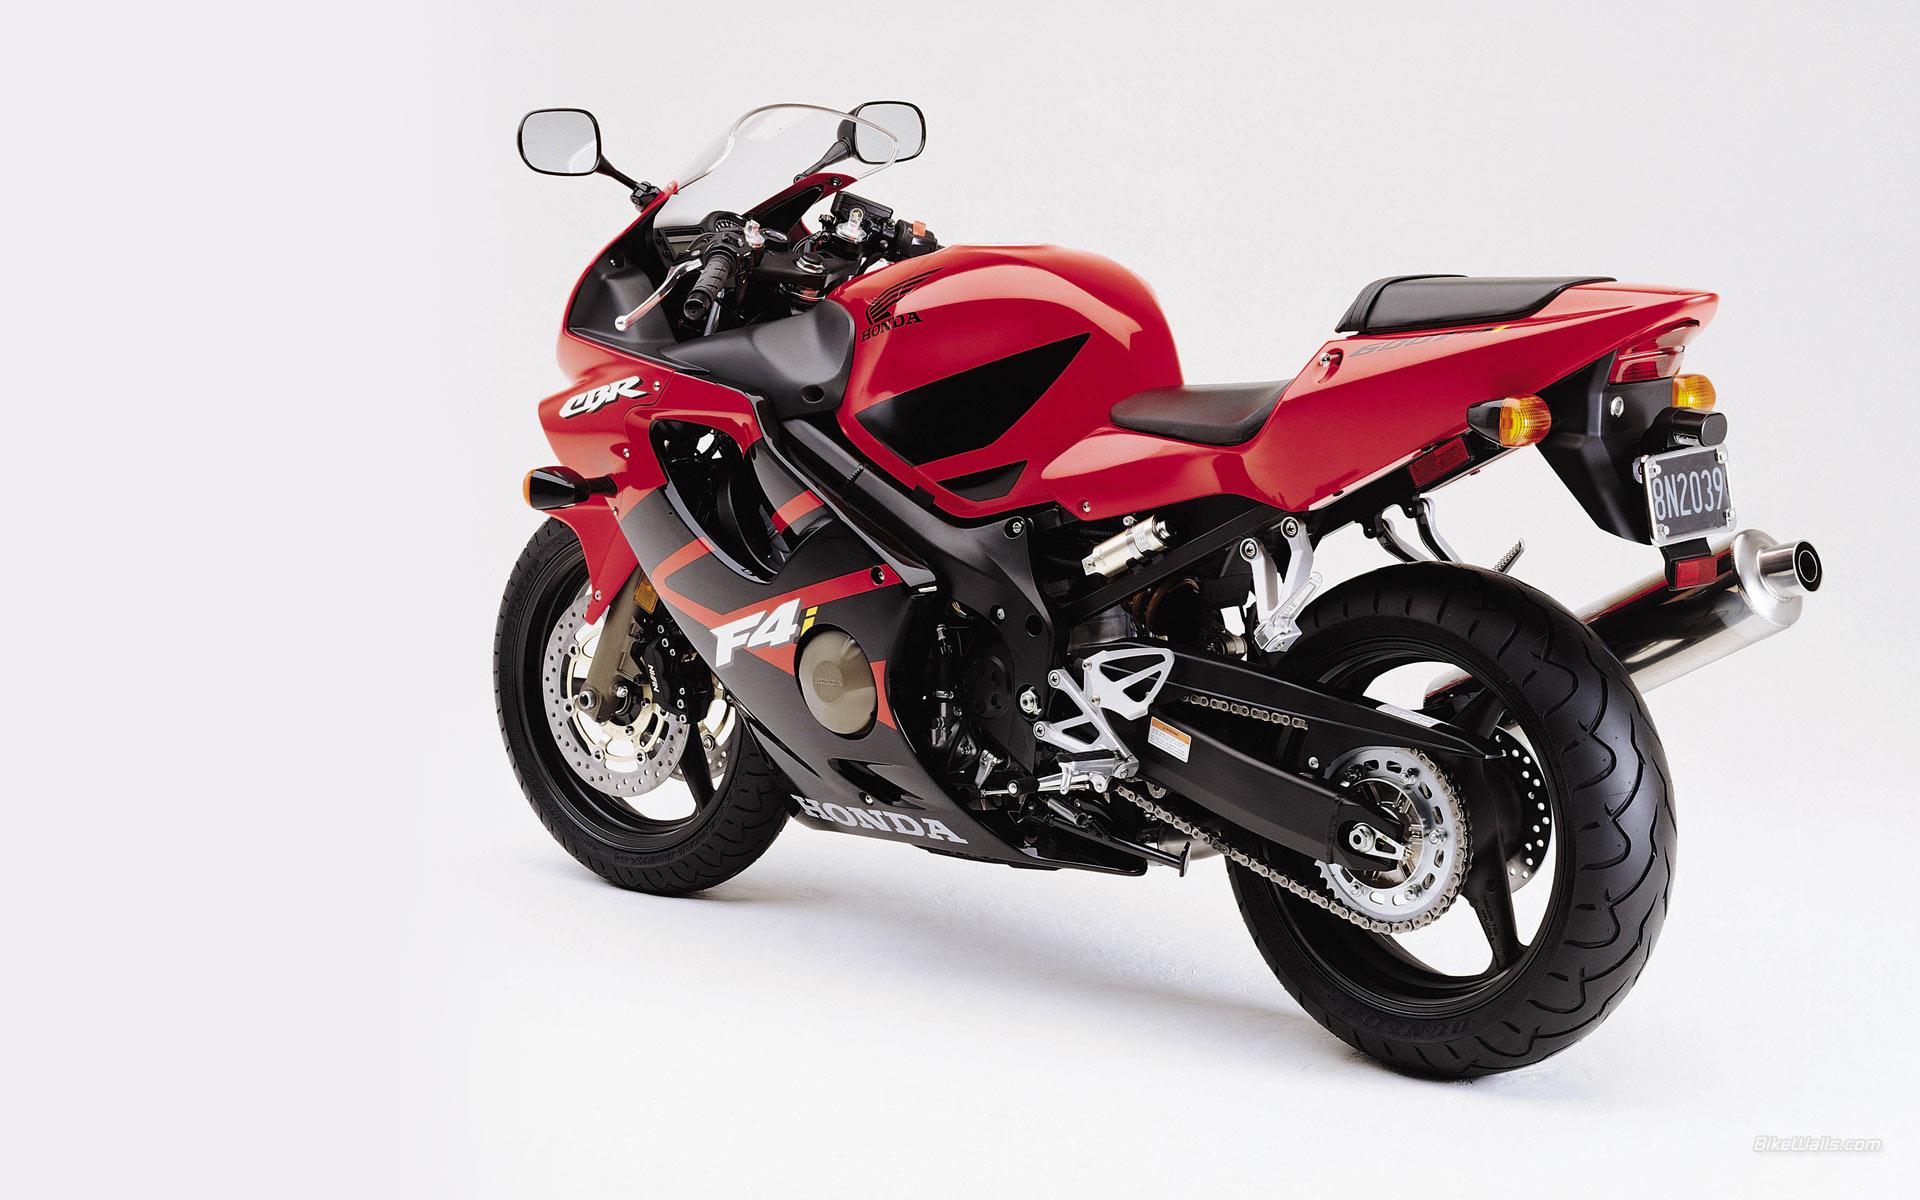 Мануалы и документация для Honda CBR600F (F1, F2, F3, F4, F4i)